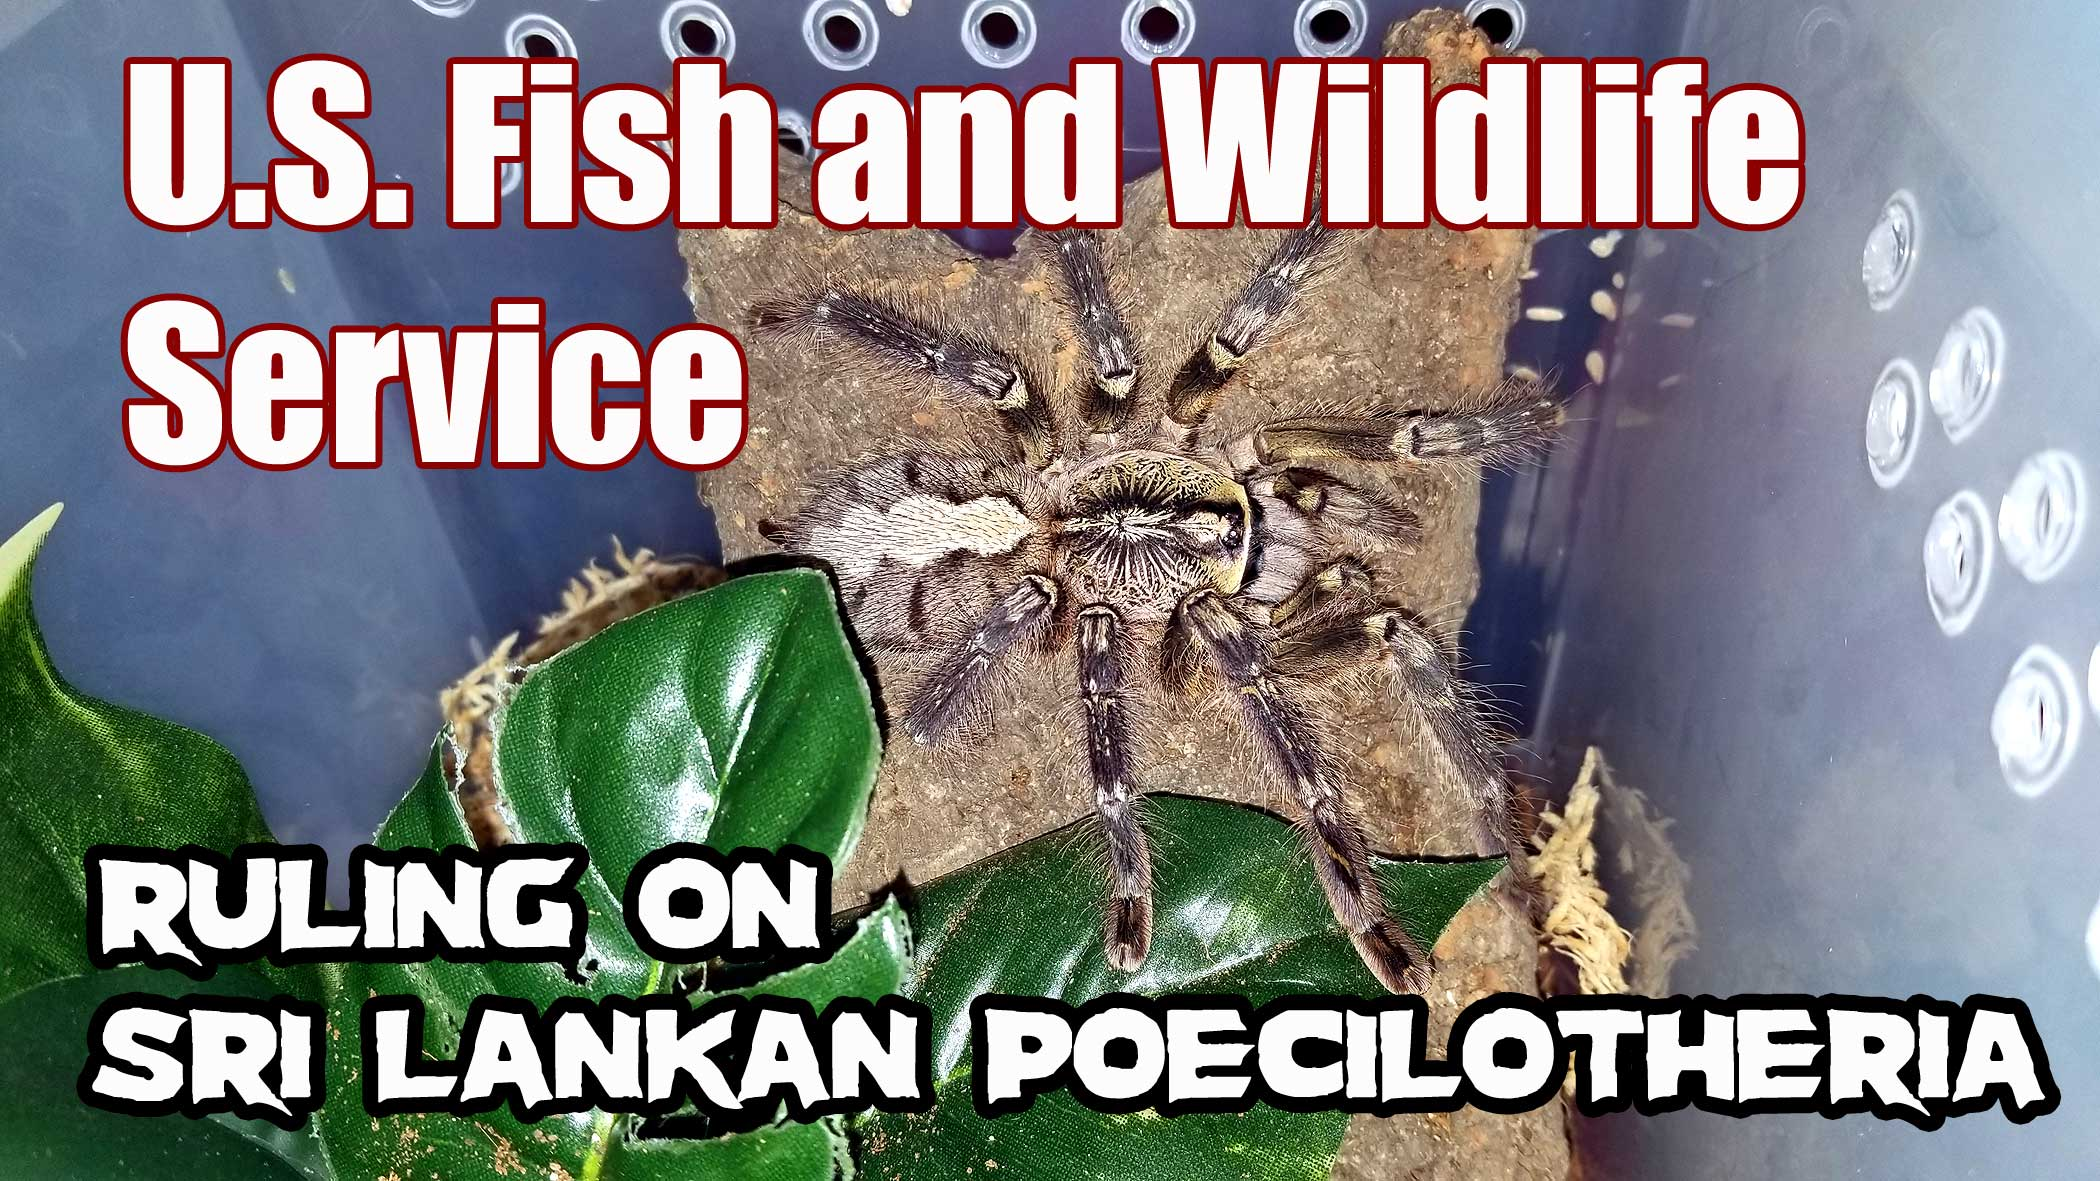 Tarantula laws | Tom's Big Spiders